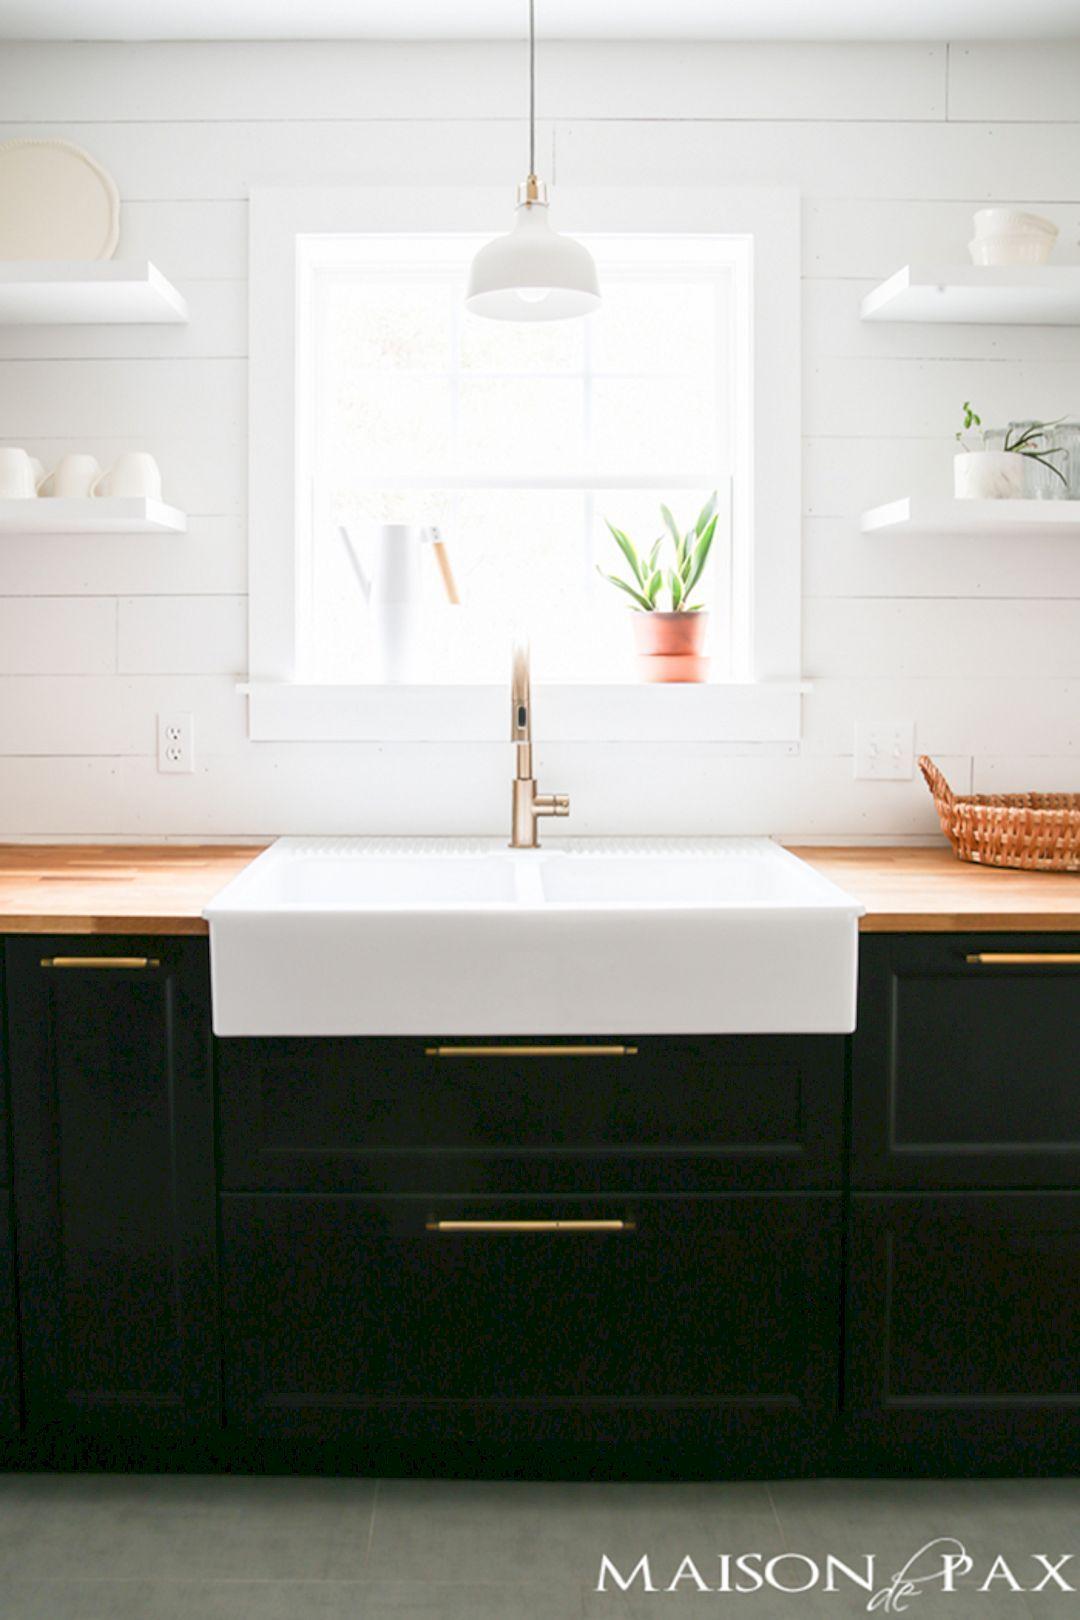 34 beautiful modern farmhouse kitchen sink designs furniture rh pinterest com Double Farmhouse Sink with Drainboard Double Farmhouse Sink with Drainboard